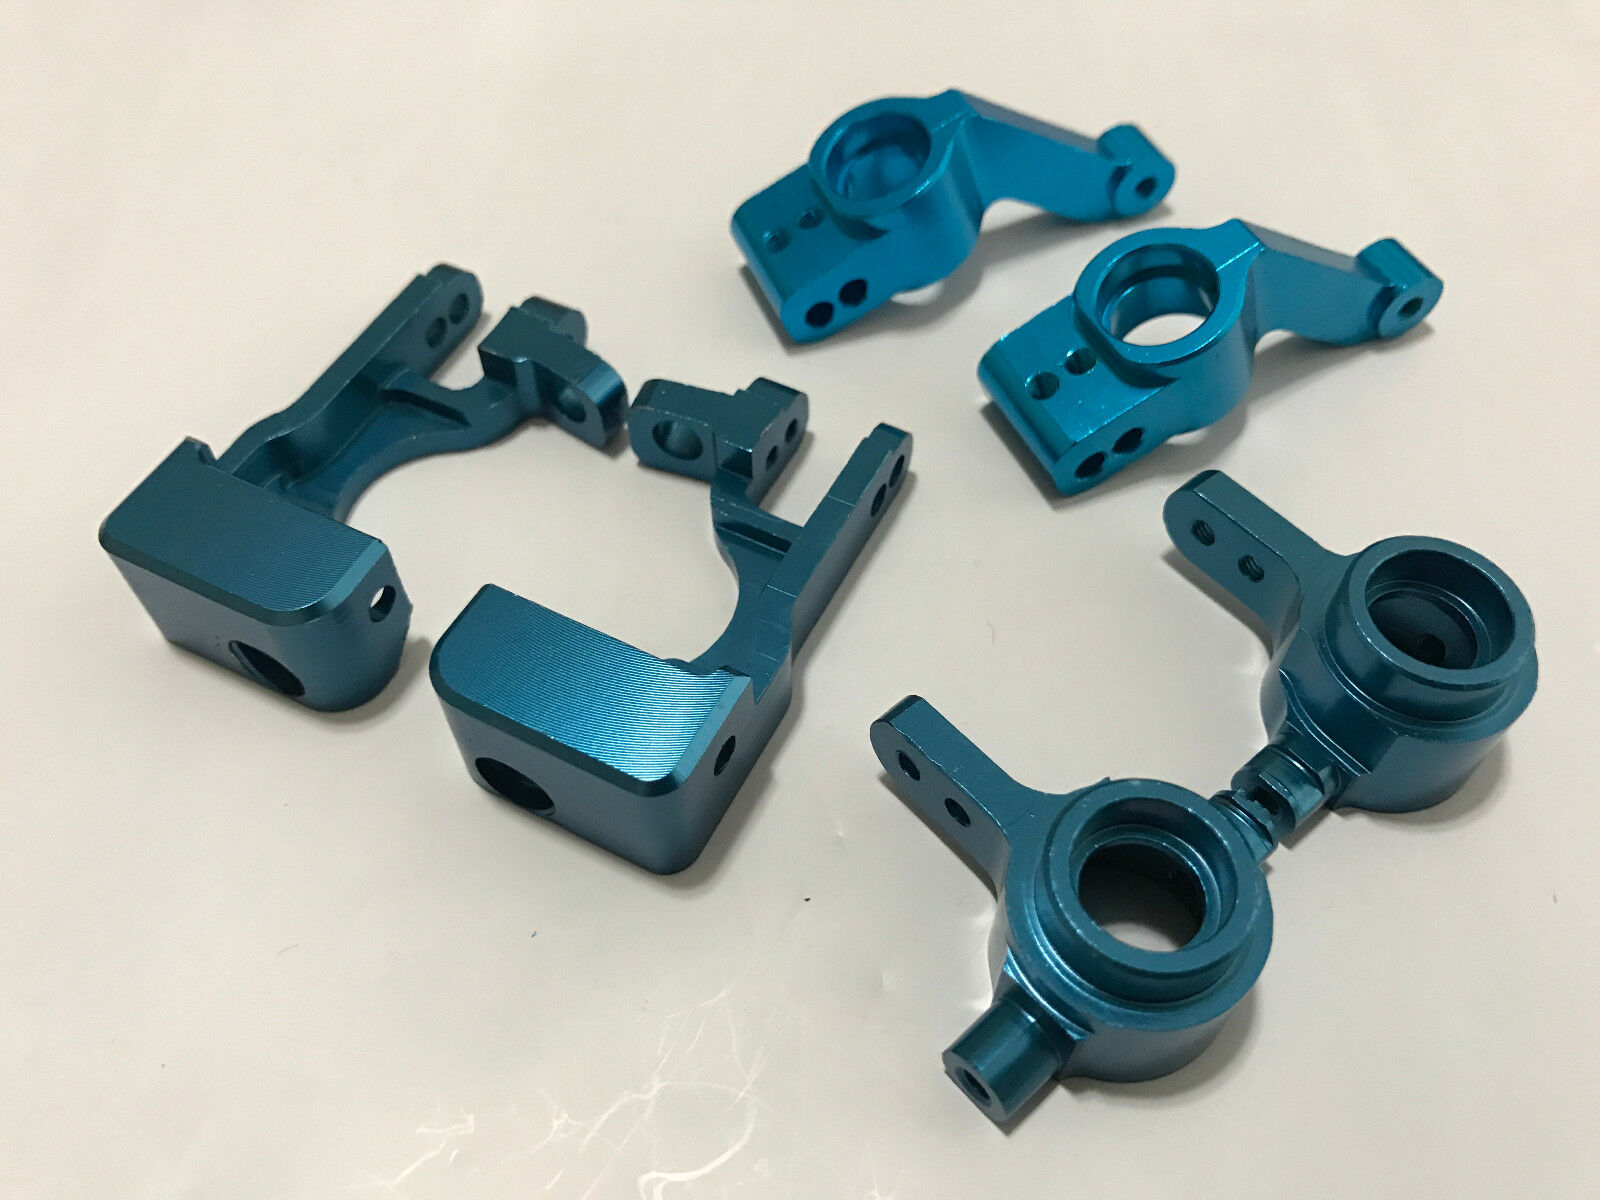 Aleación de directivo C-hubs Nudillos Eje Portadores bloque Traxxas Stampede 4x4 Azul